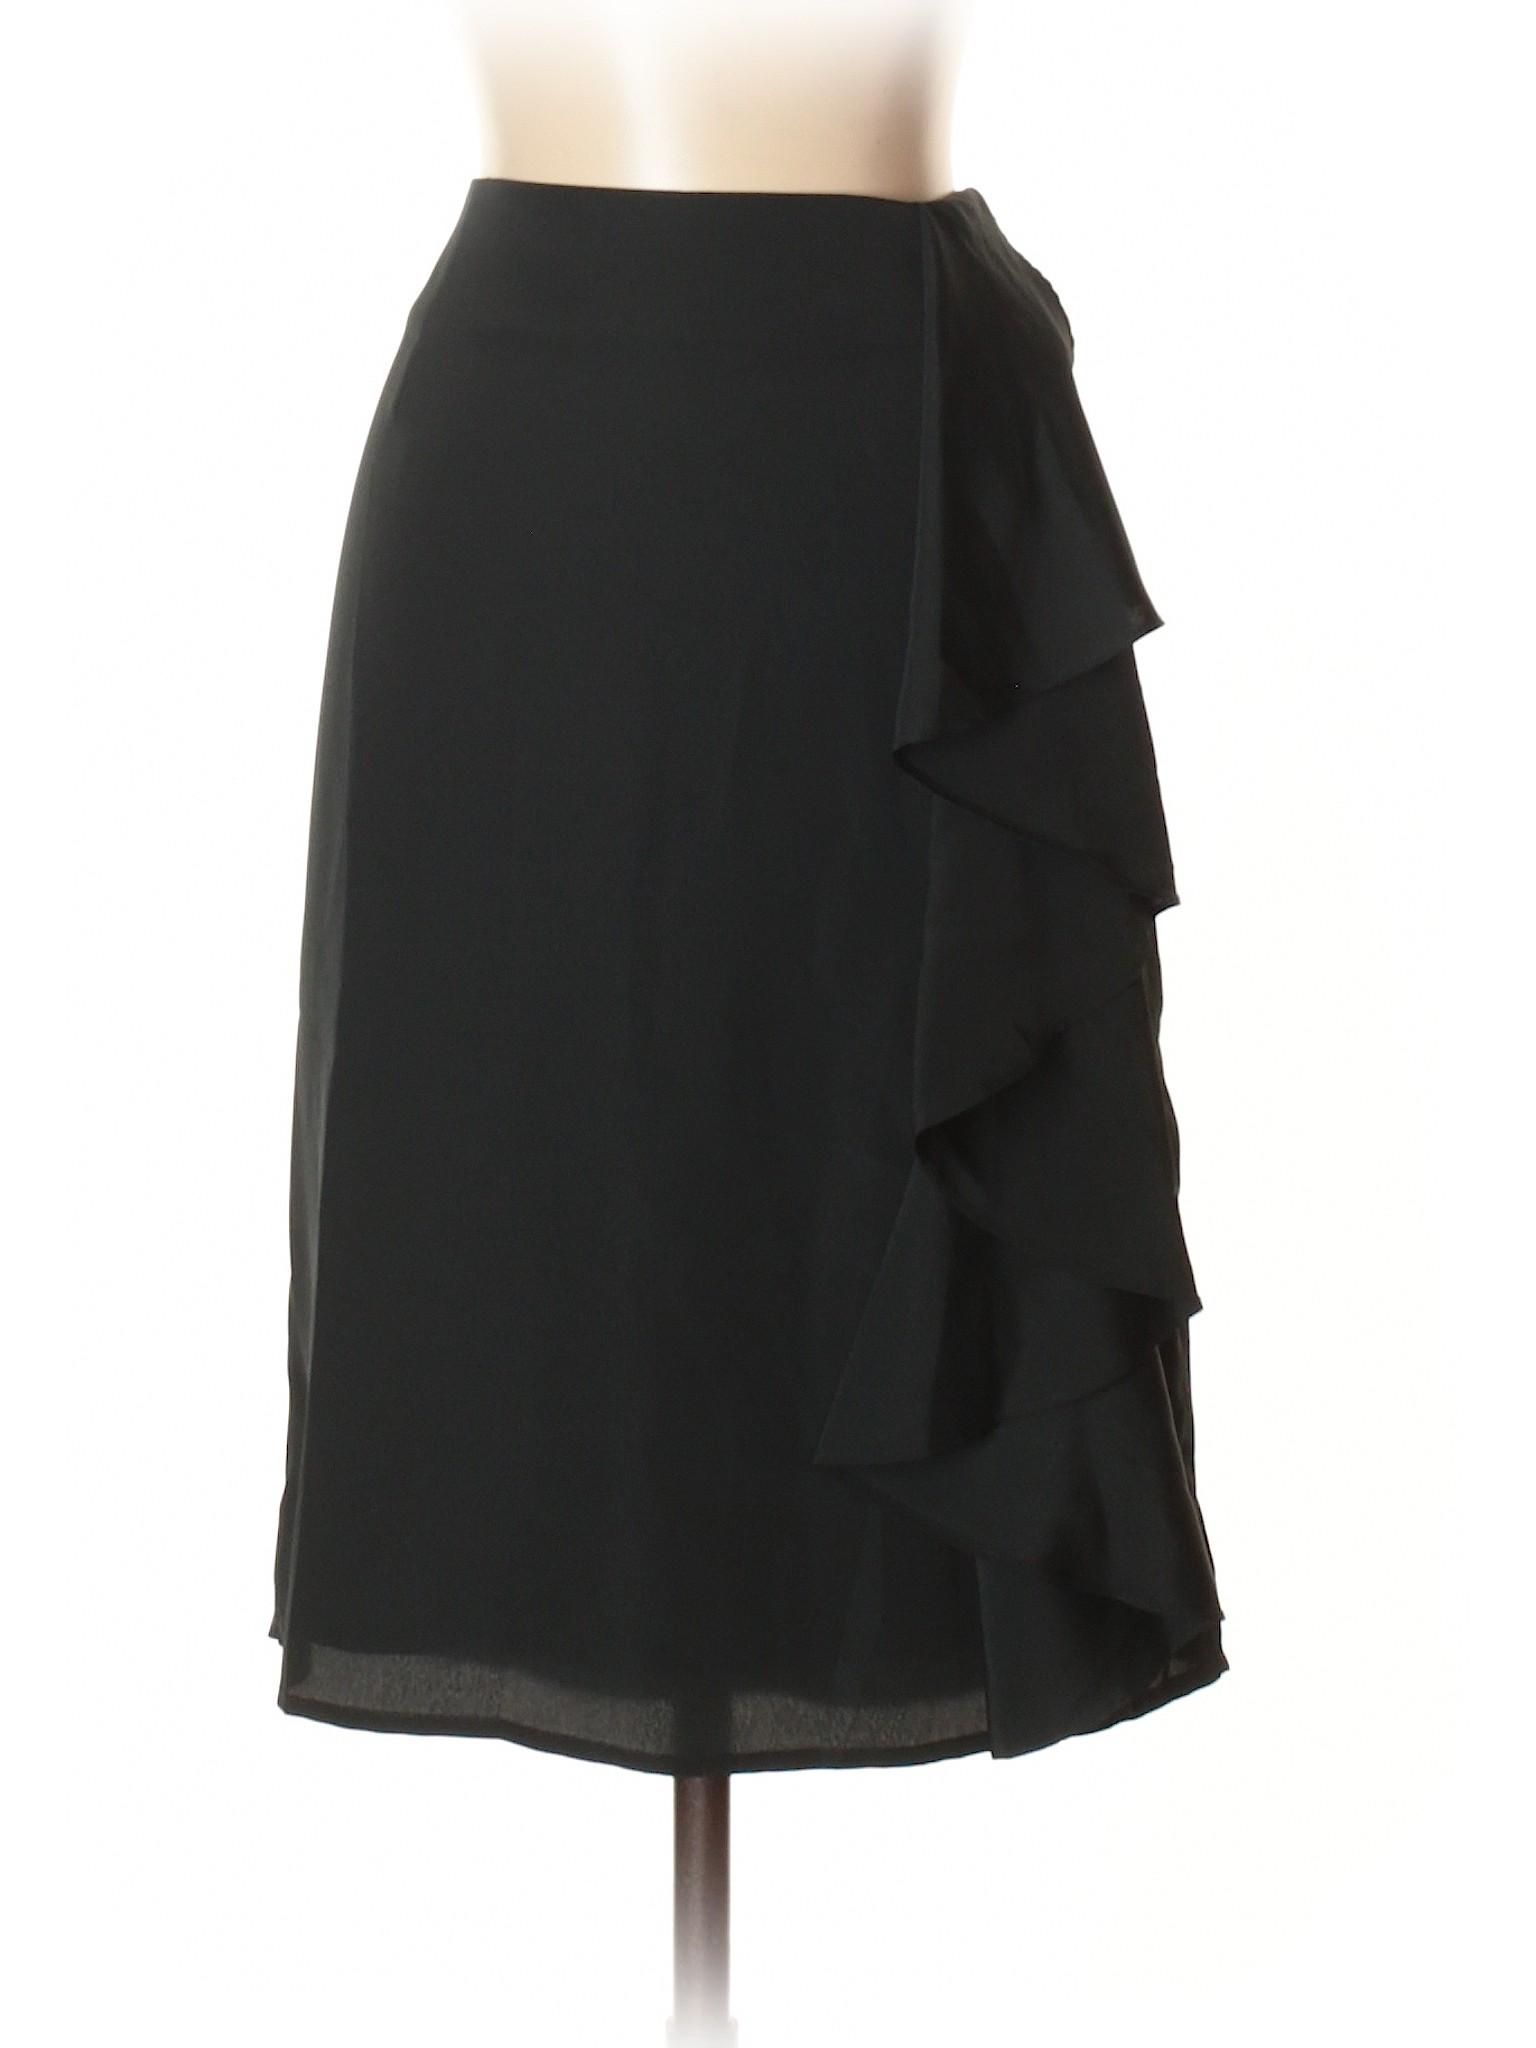 Boutique Casual Boutique Boutique Skirt Casual Casual Skirt Casual Boutique Boutique Skirt Skirt wzwORqav